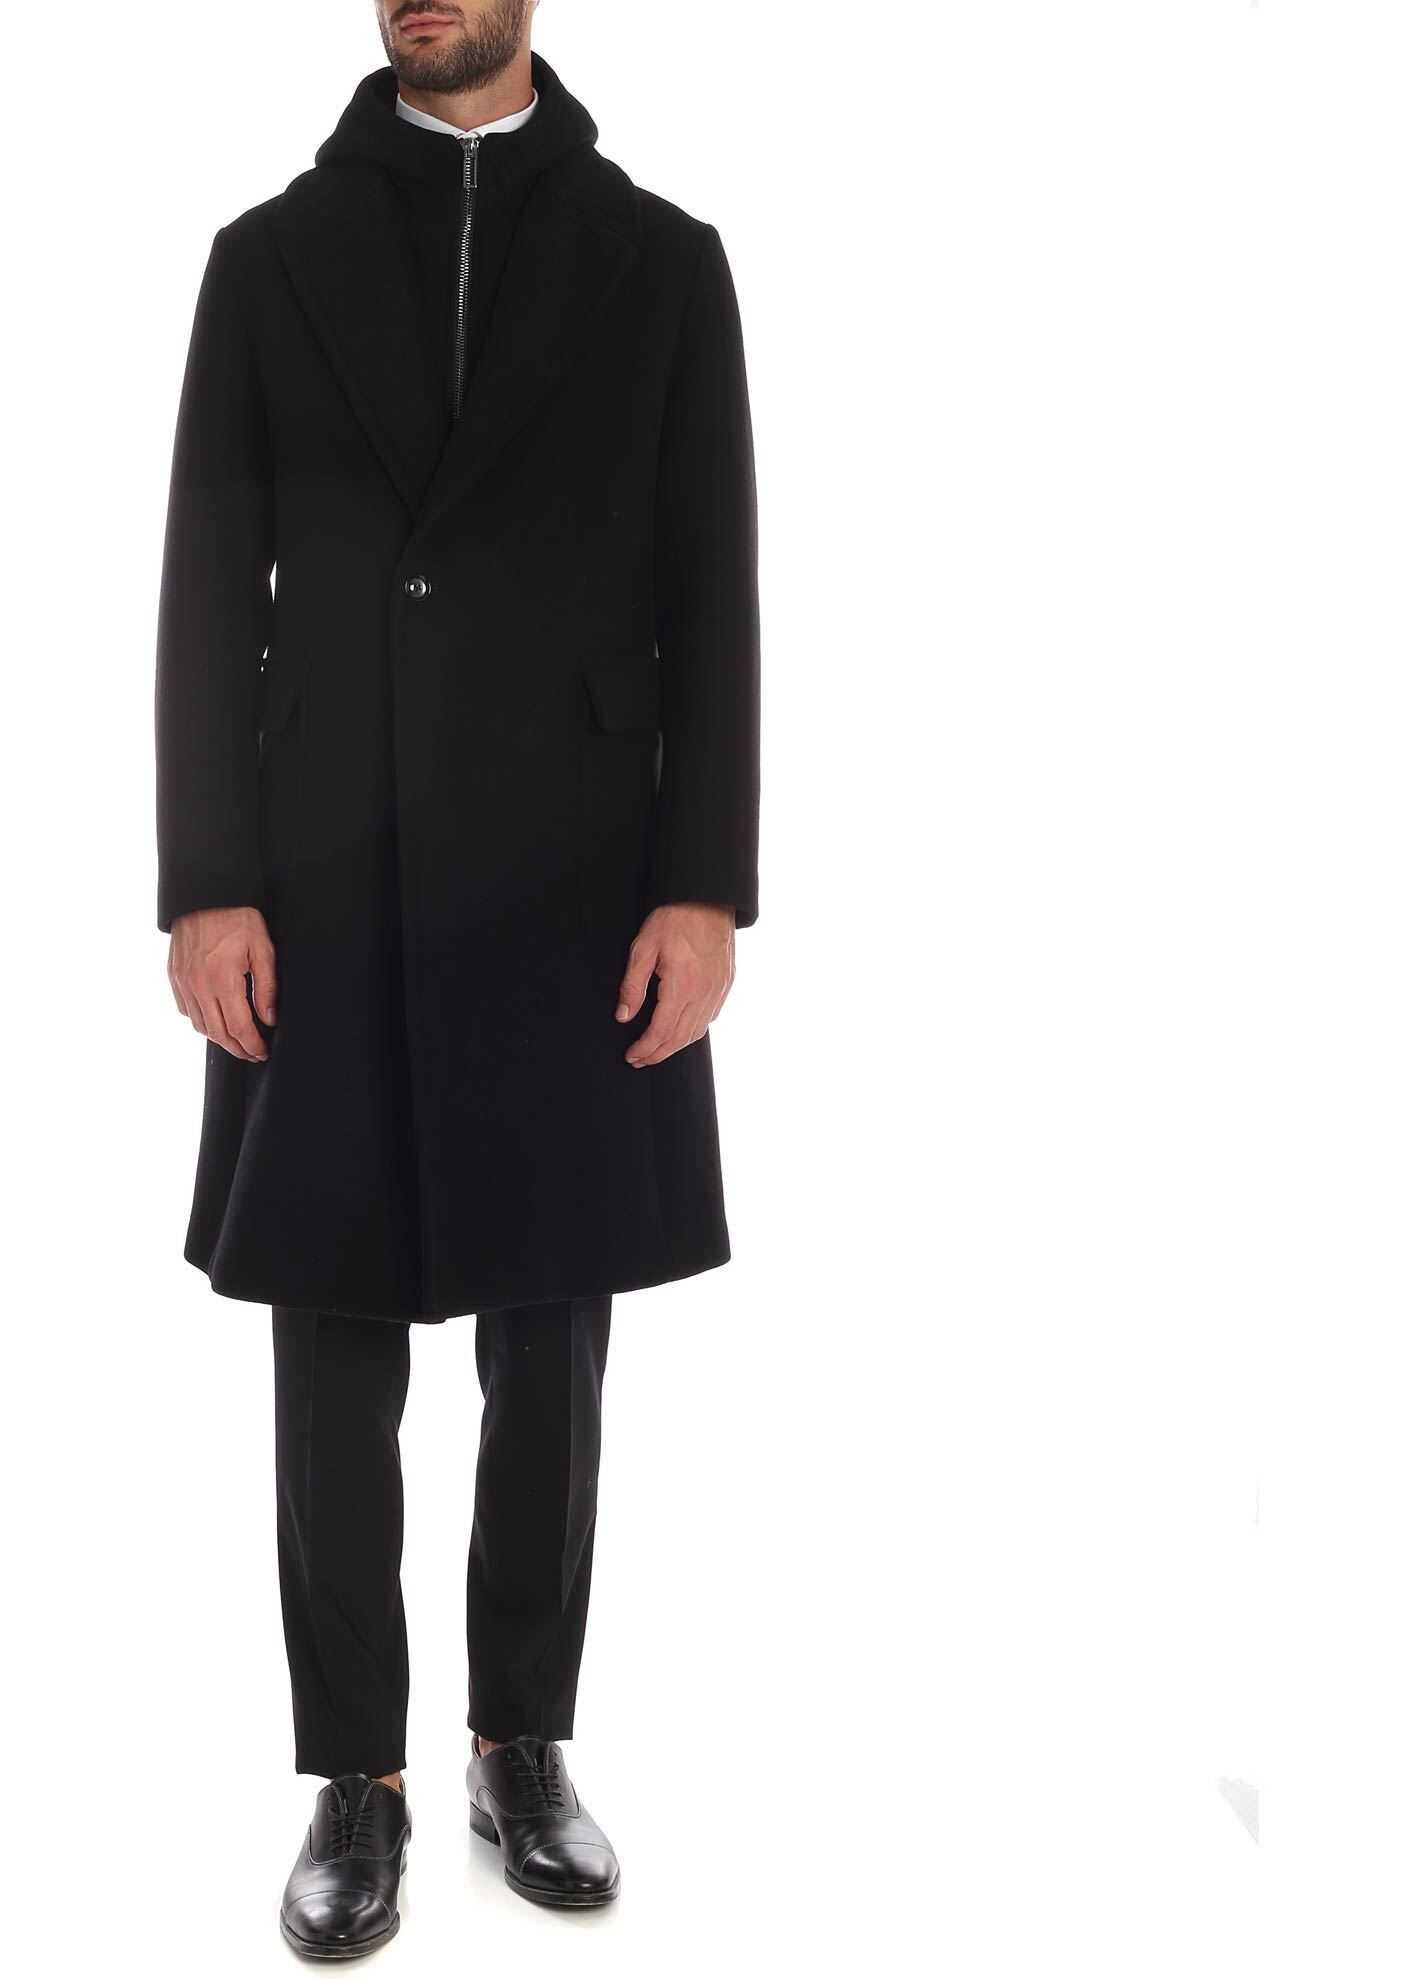 Emporio Armani Black Hooded Coat Black